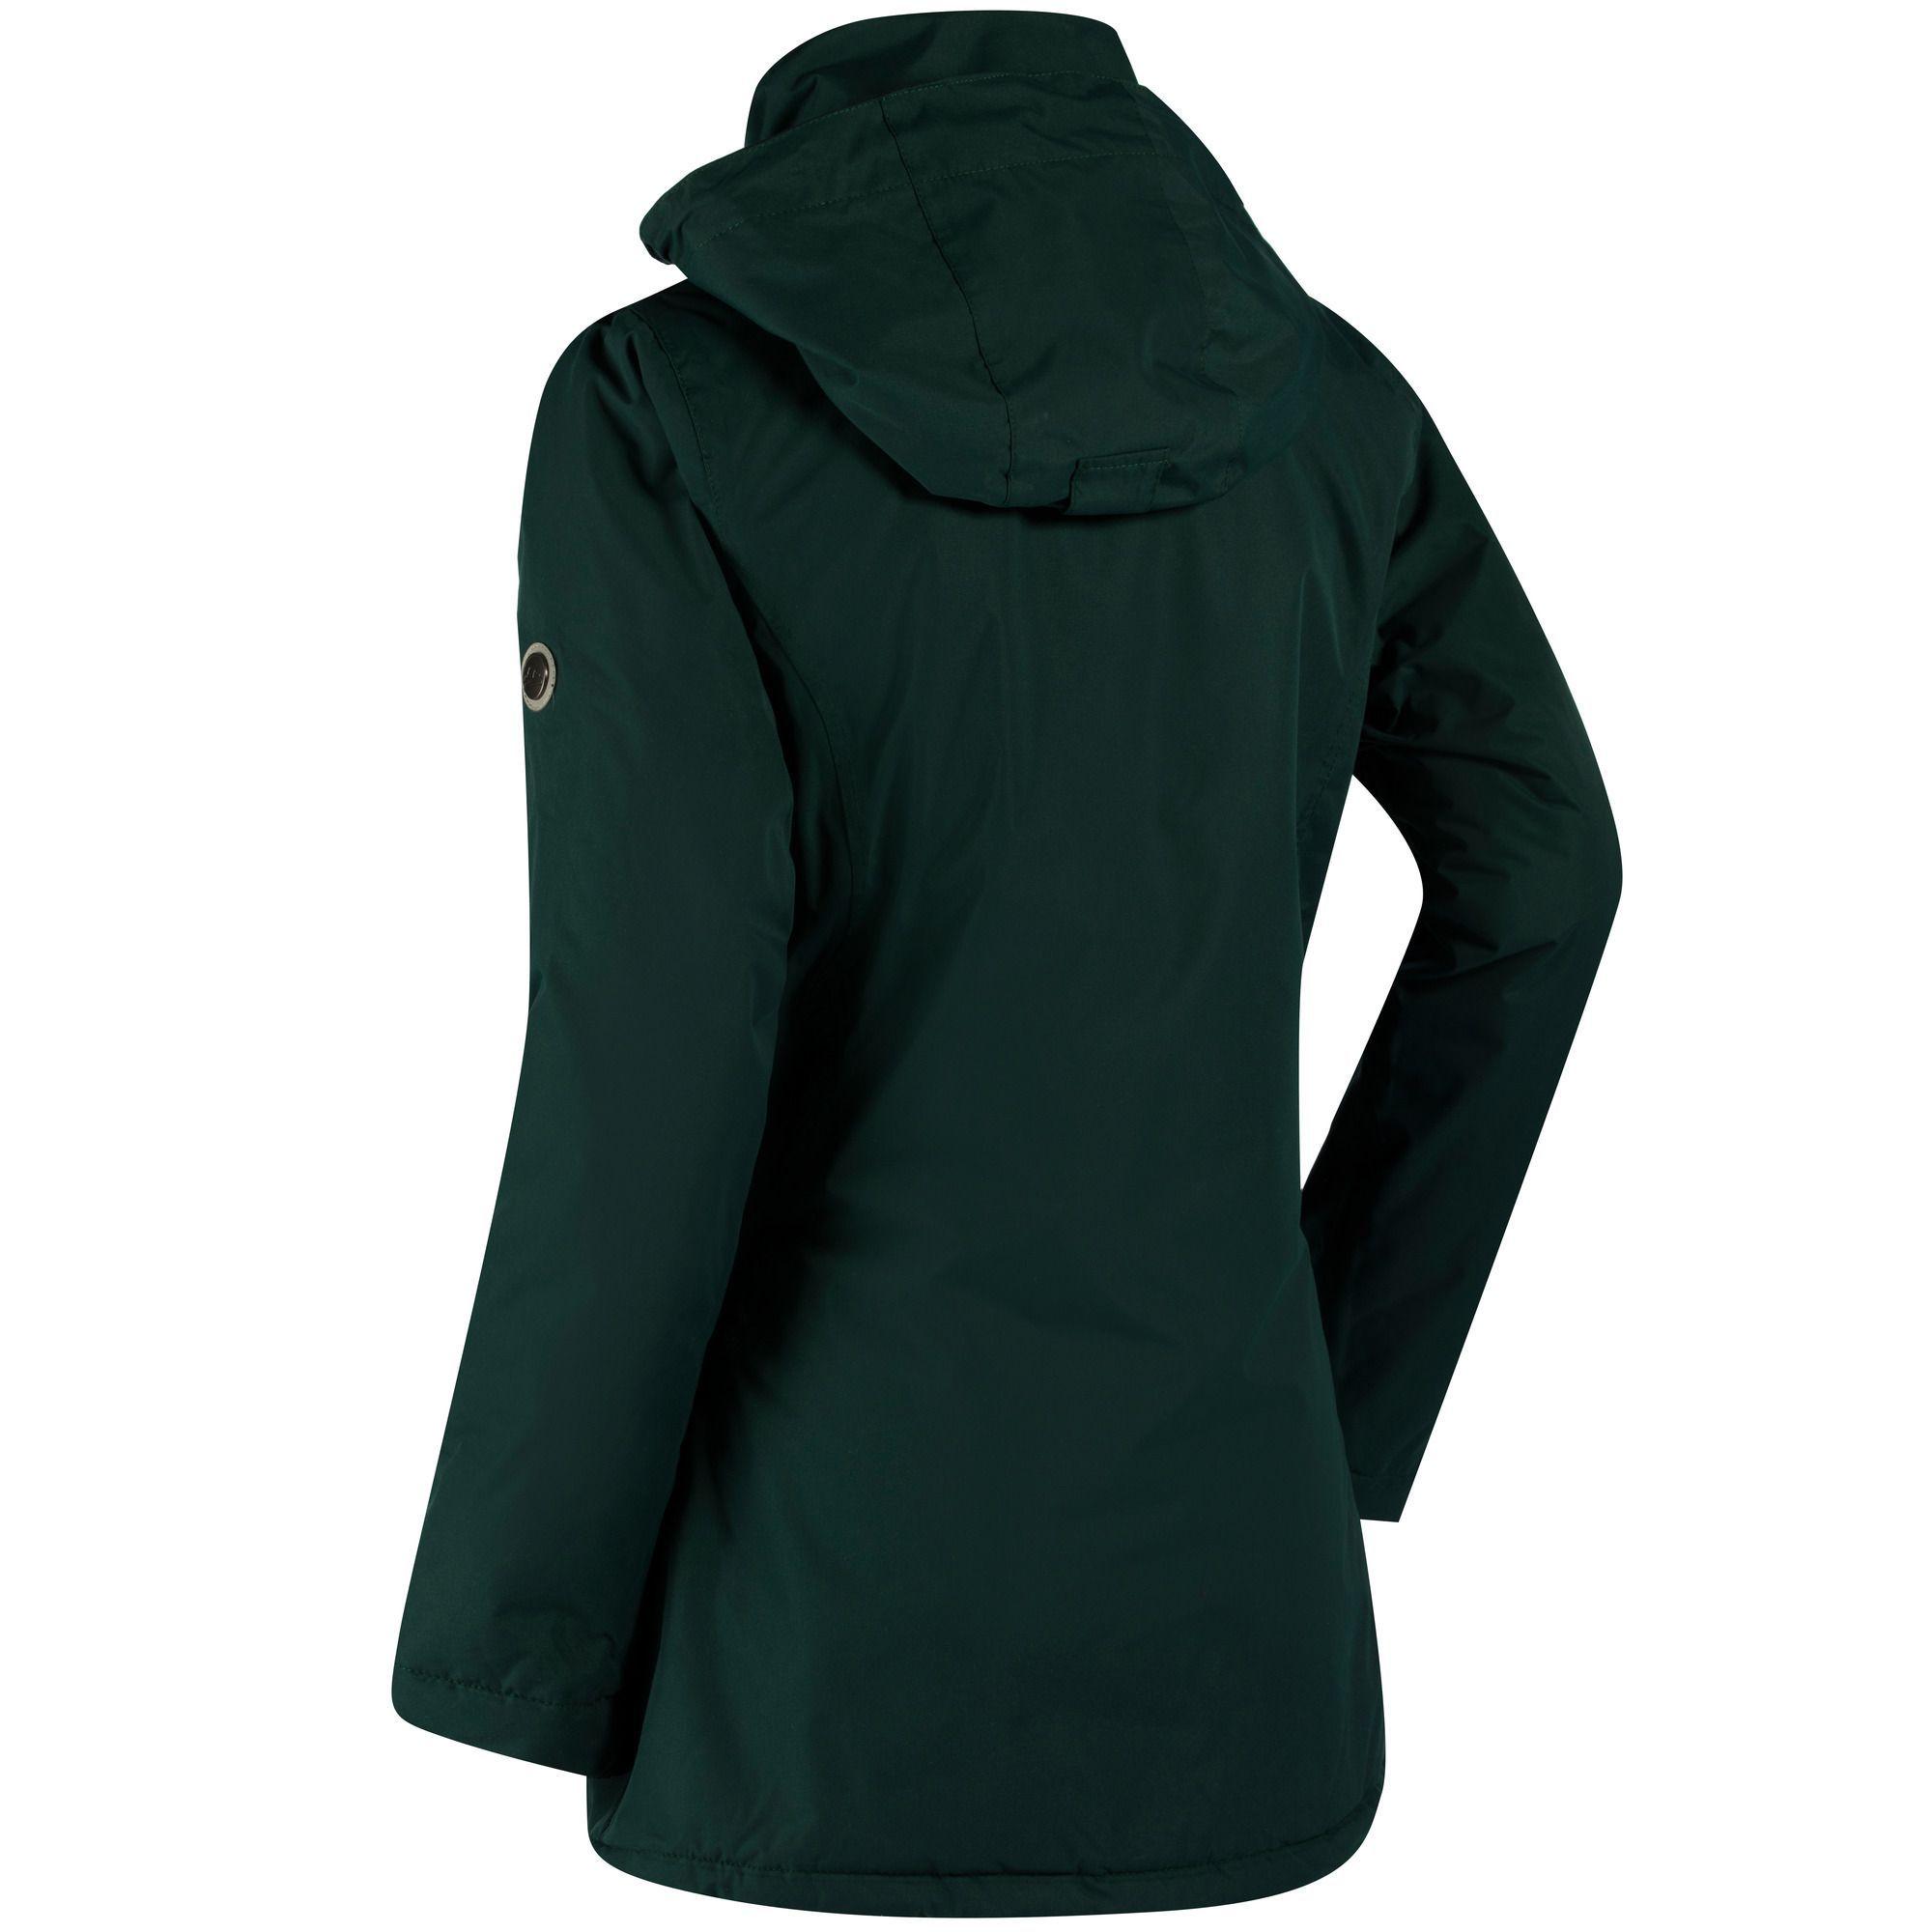 Regatta Womens/Ladies Blanchet II Jacket (Deep Pine)